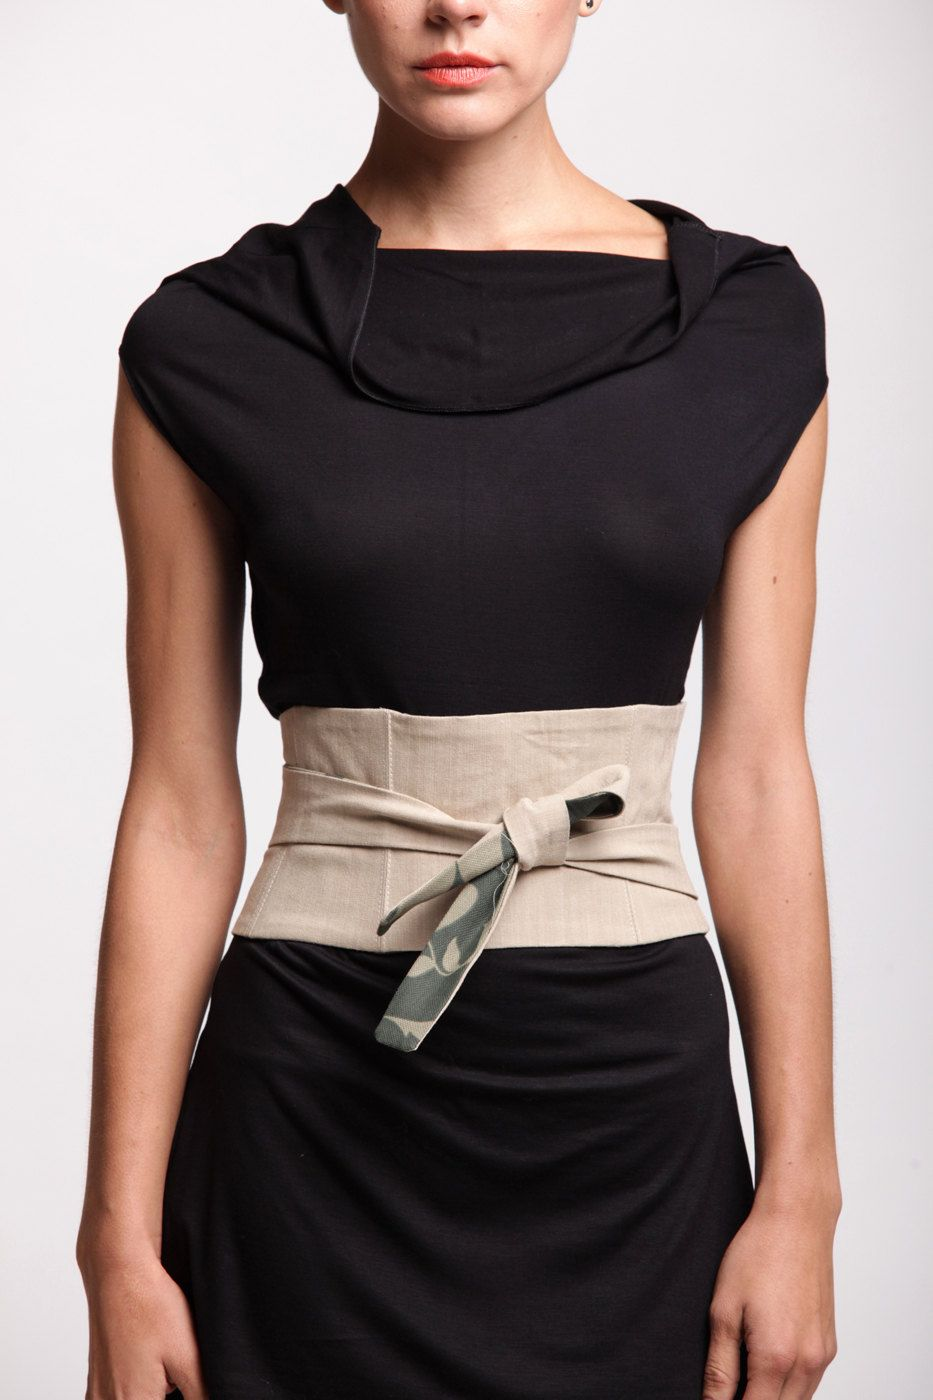 Of Obi 2019 Dresses Cinture Vita In Nel ValorizzarlaDetails Per 5A34LjR